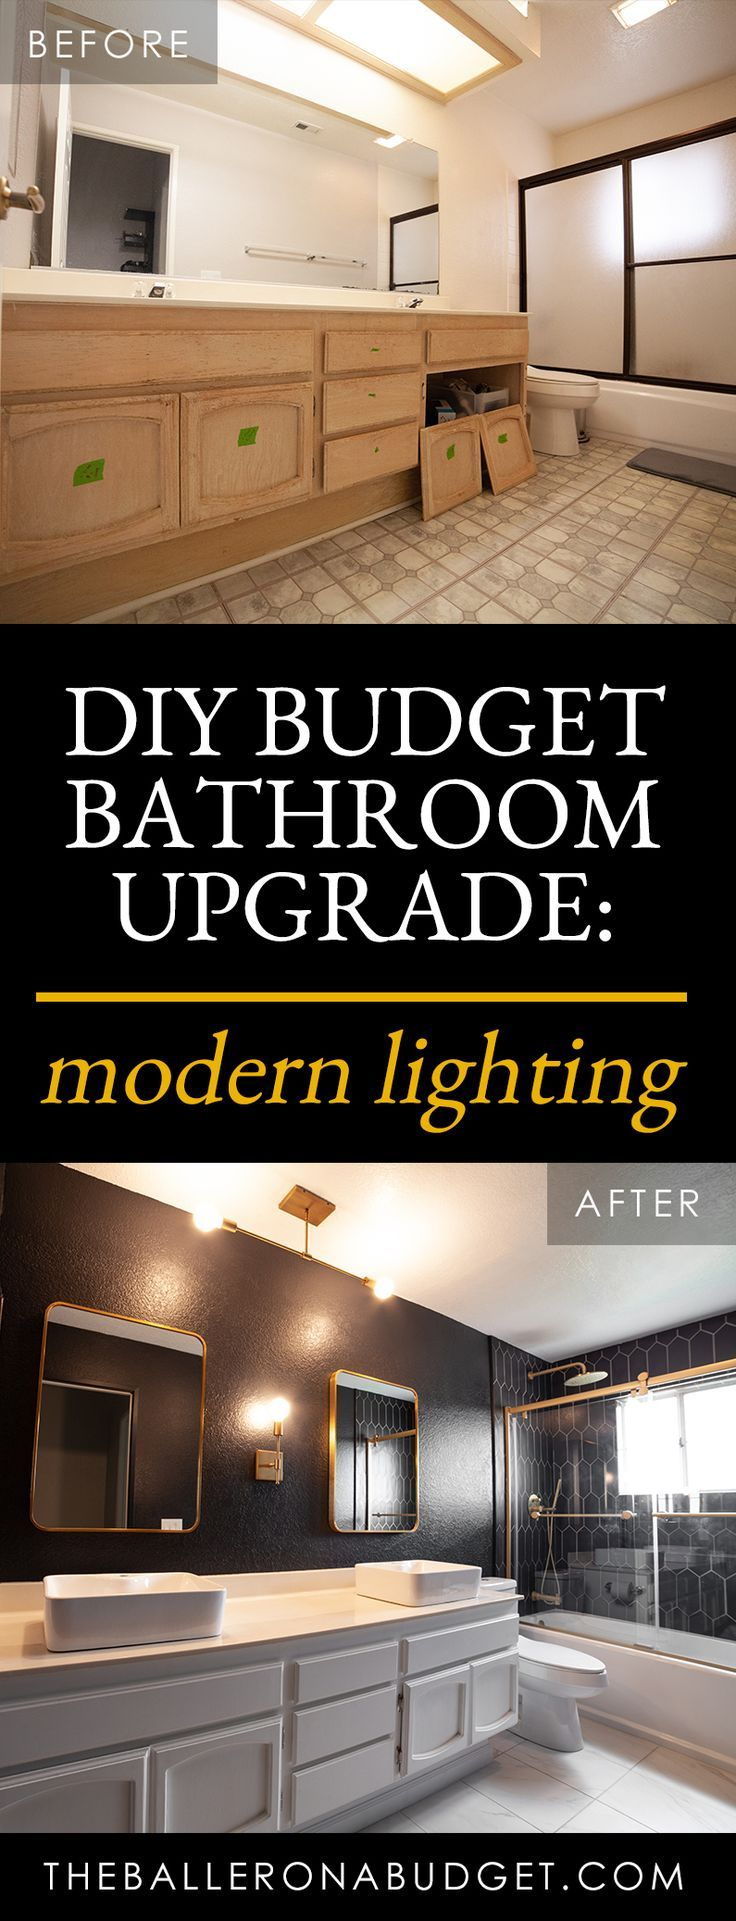 Hallway Bathroom Update: Updated Vanity and Lights Featuring Lights.com